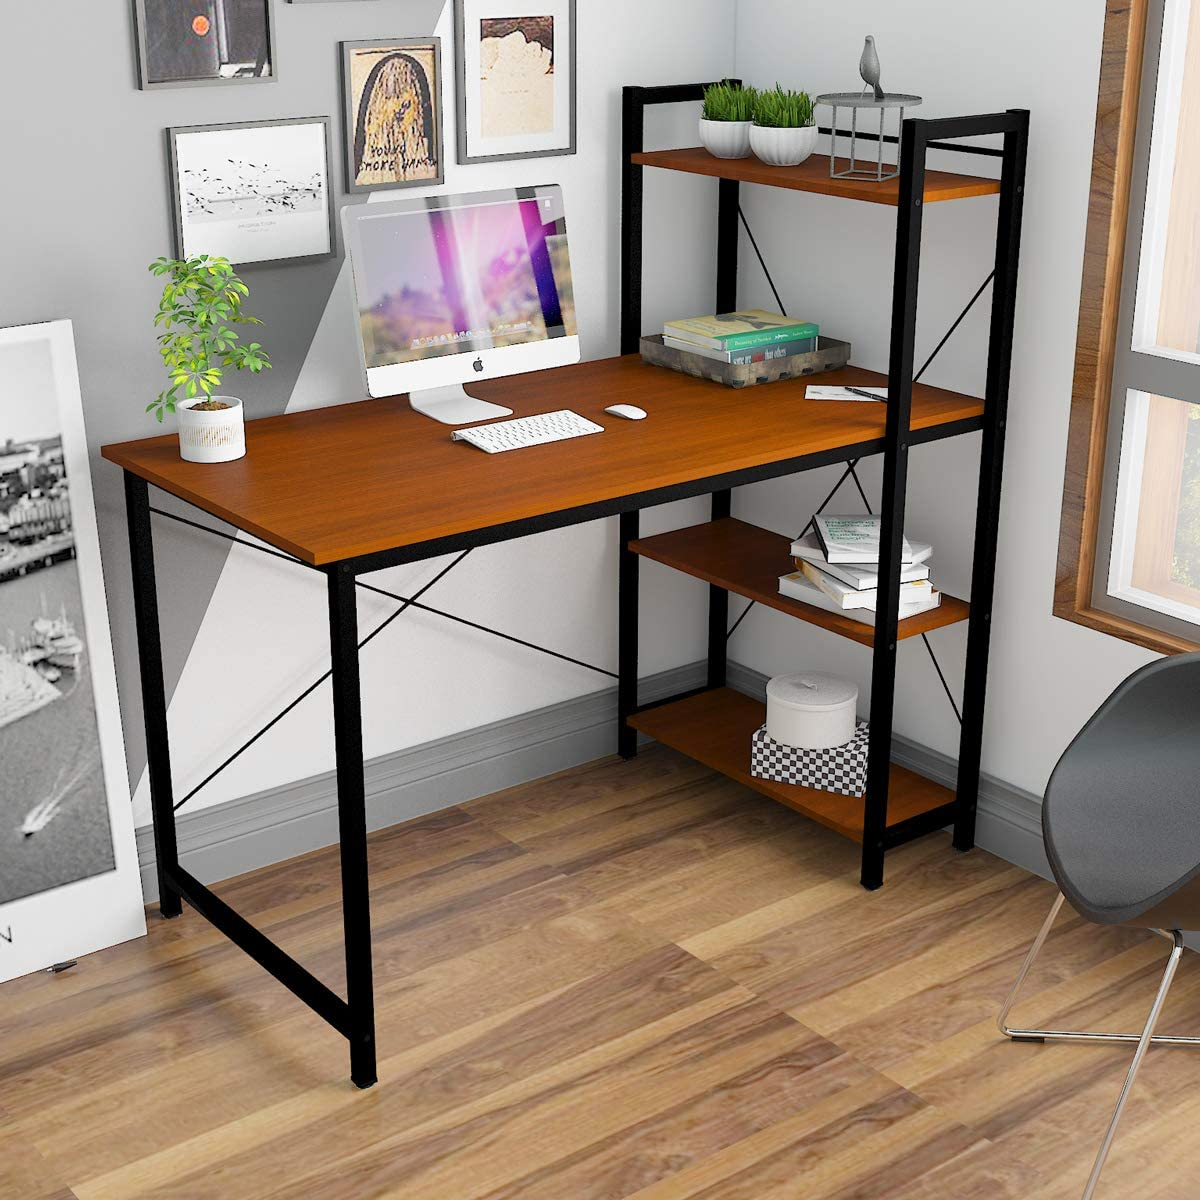 Hironpal Computer Desk Study Table Workstation Pc Laptop Desk Table With 4 Tier Shelves For Storage Home Office Desk Study Wring Desk Gaming Table Furniture Sets For Living Room Bedroom Home